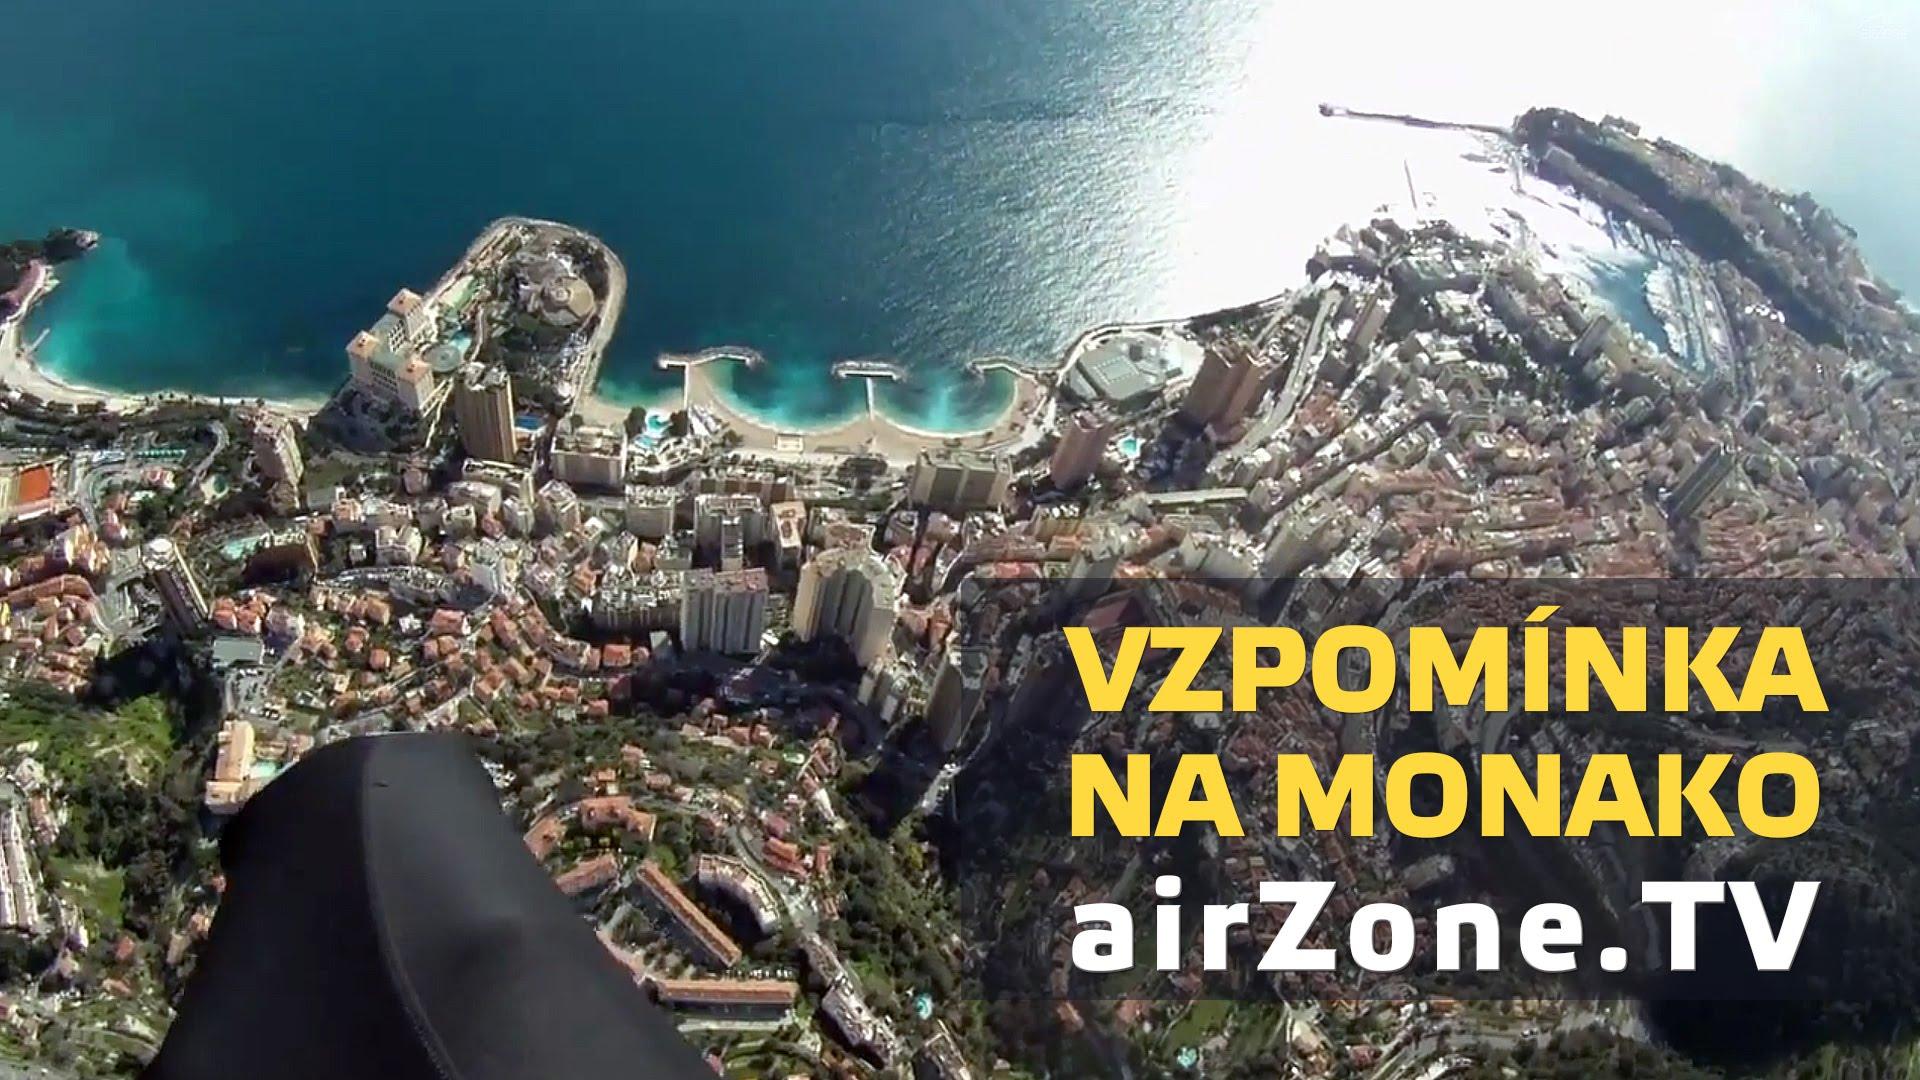 airZone.TV – 8. 12. 2014 – Vzpomínka na Monako